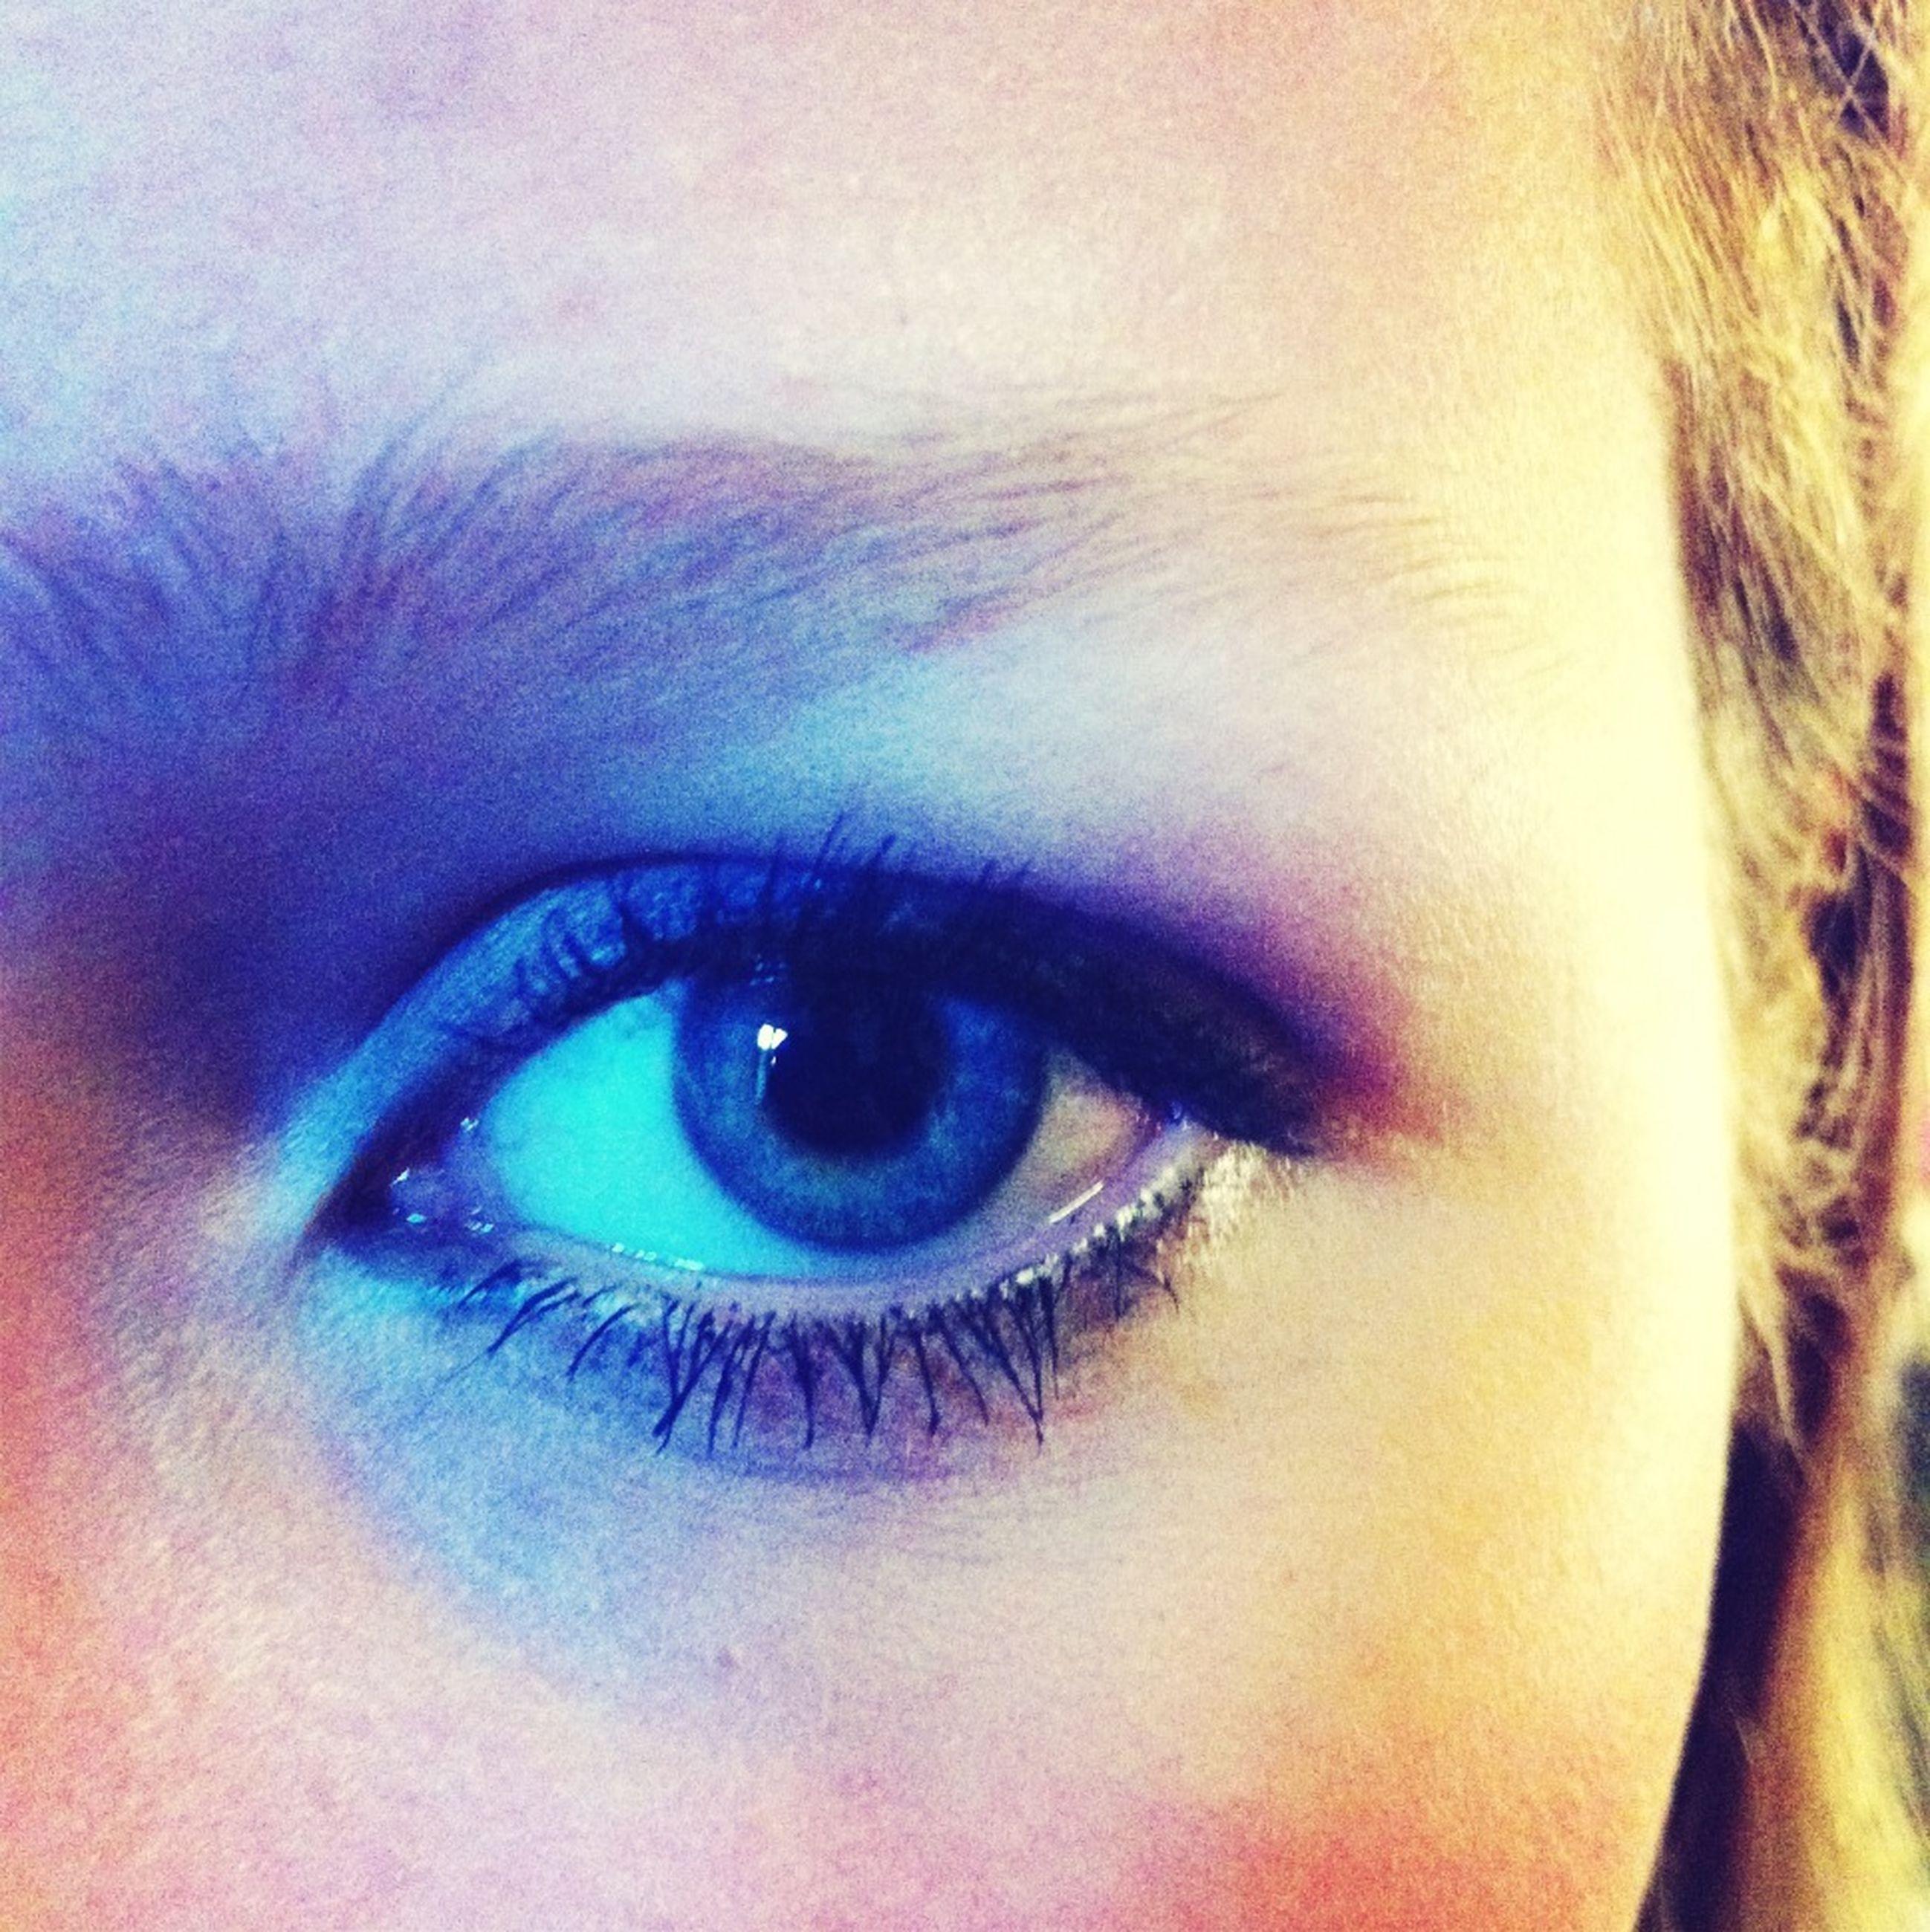 human eye, looking at camera, eyelash, close-up, portrait, human face, headshot, eyesight, lifestyles, young adult, human skin, sensory perception, part of, eyebrow, eyeball, iris - eye, person